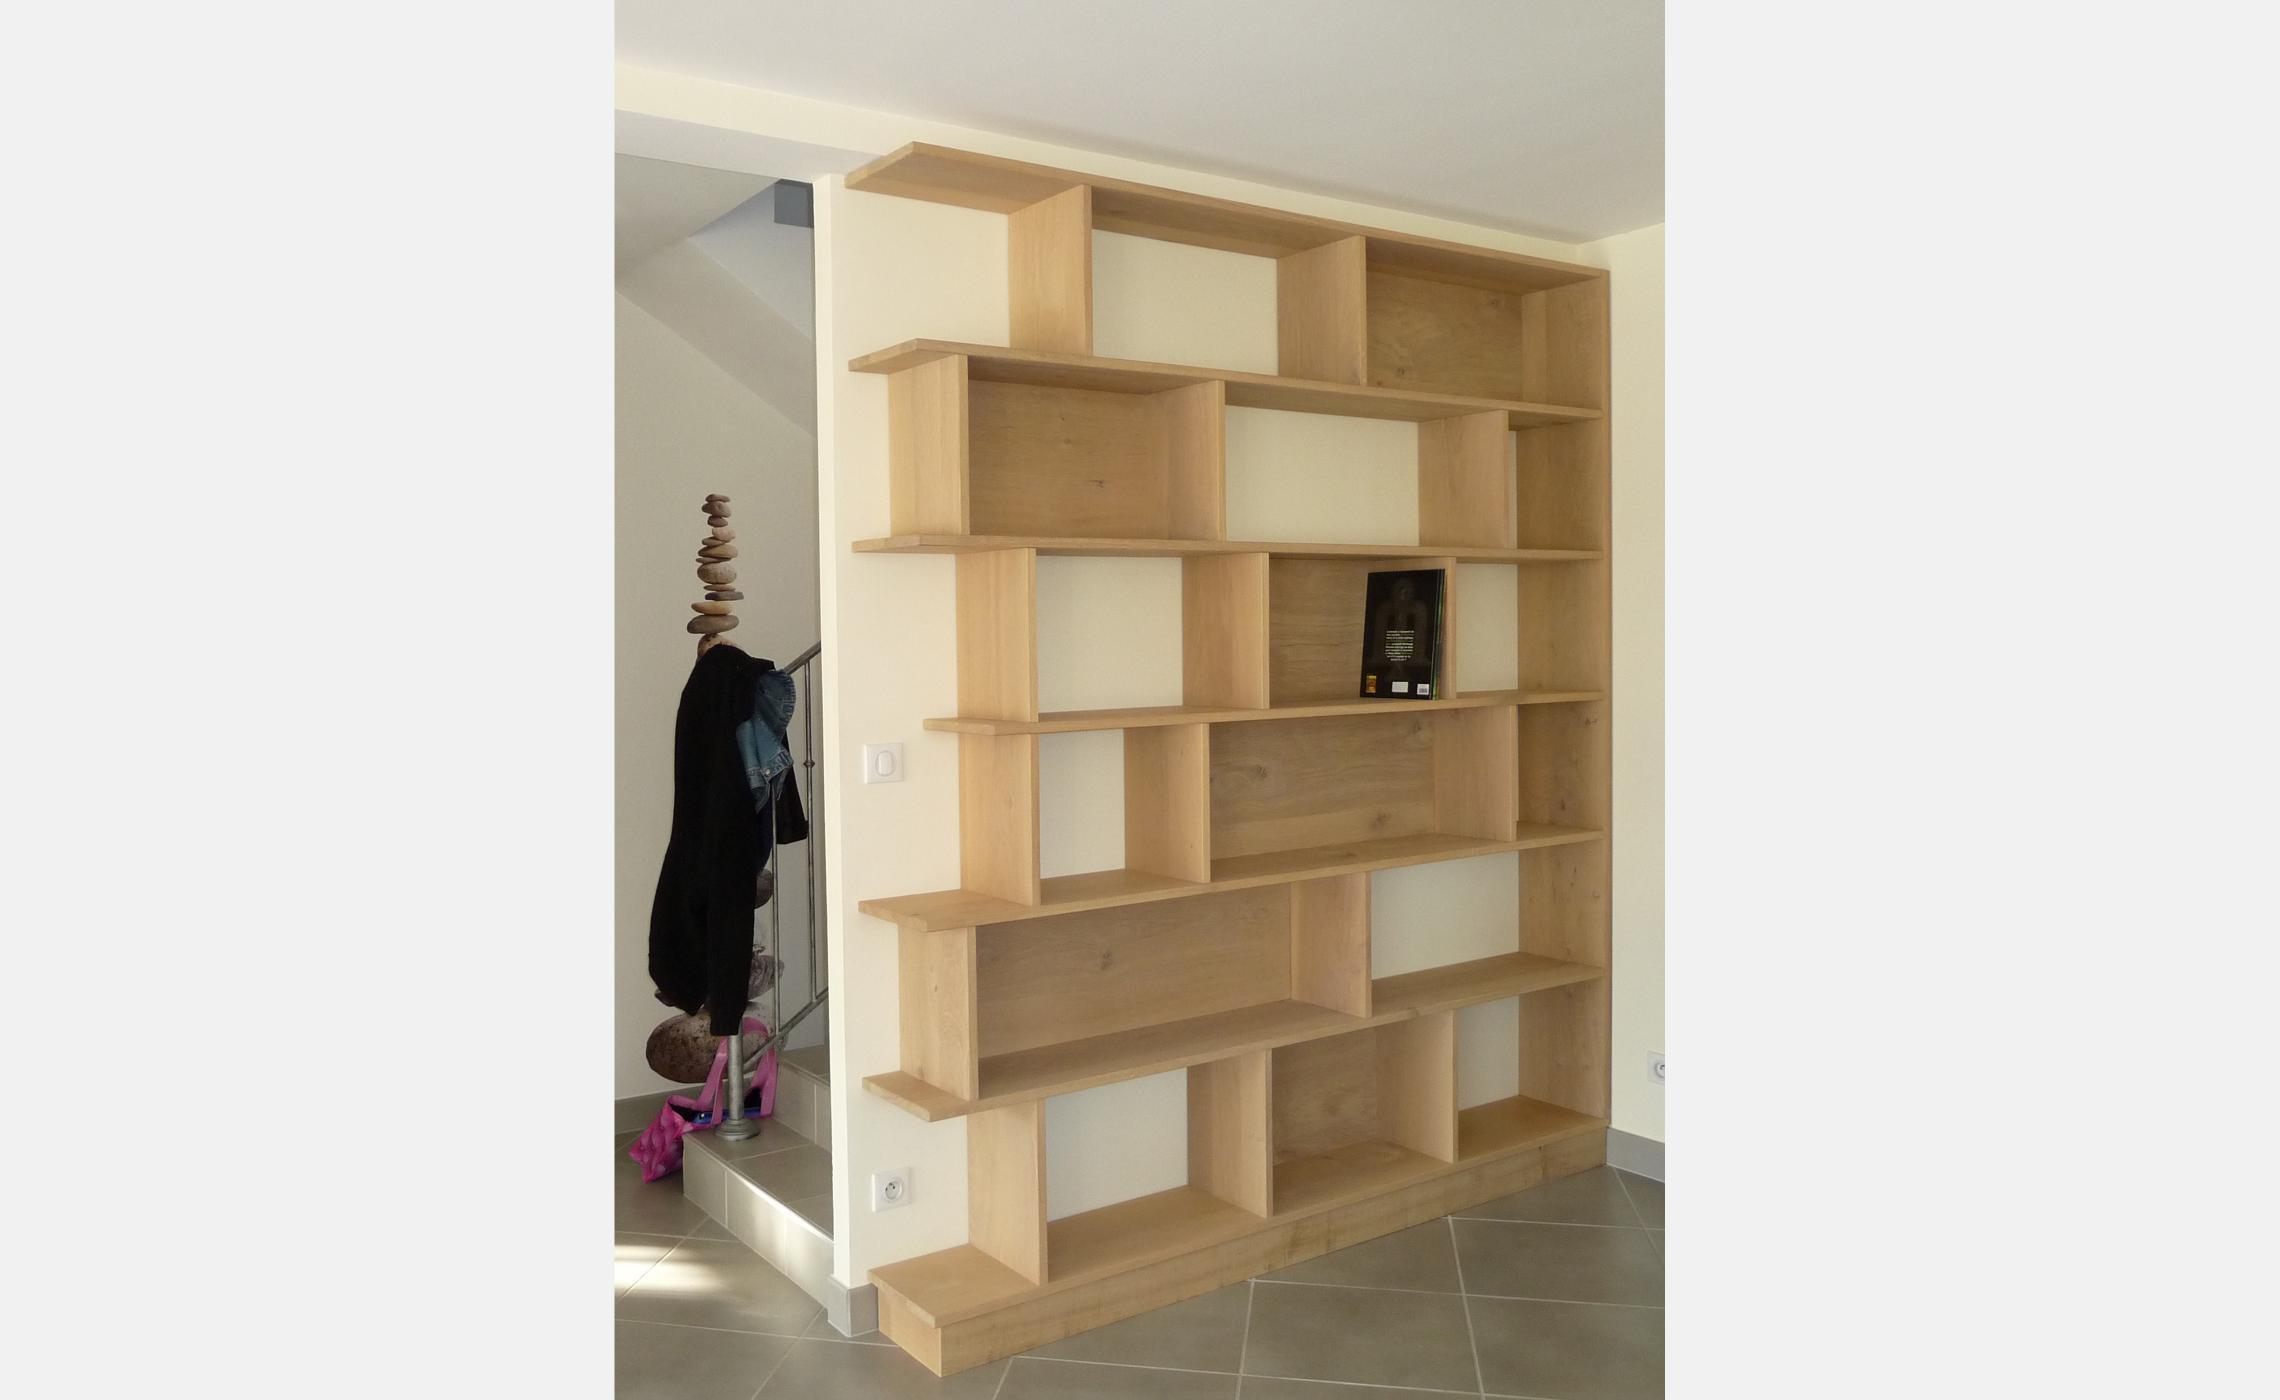 Biblioth que sur mesure en ch ne sur mesure delorme meubles - Bibliotheque sur mesure lapeyre ...